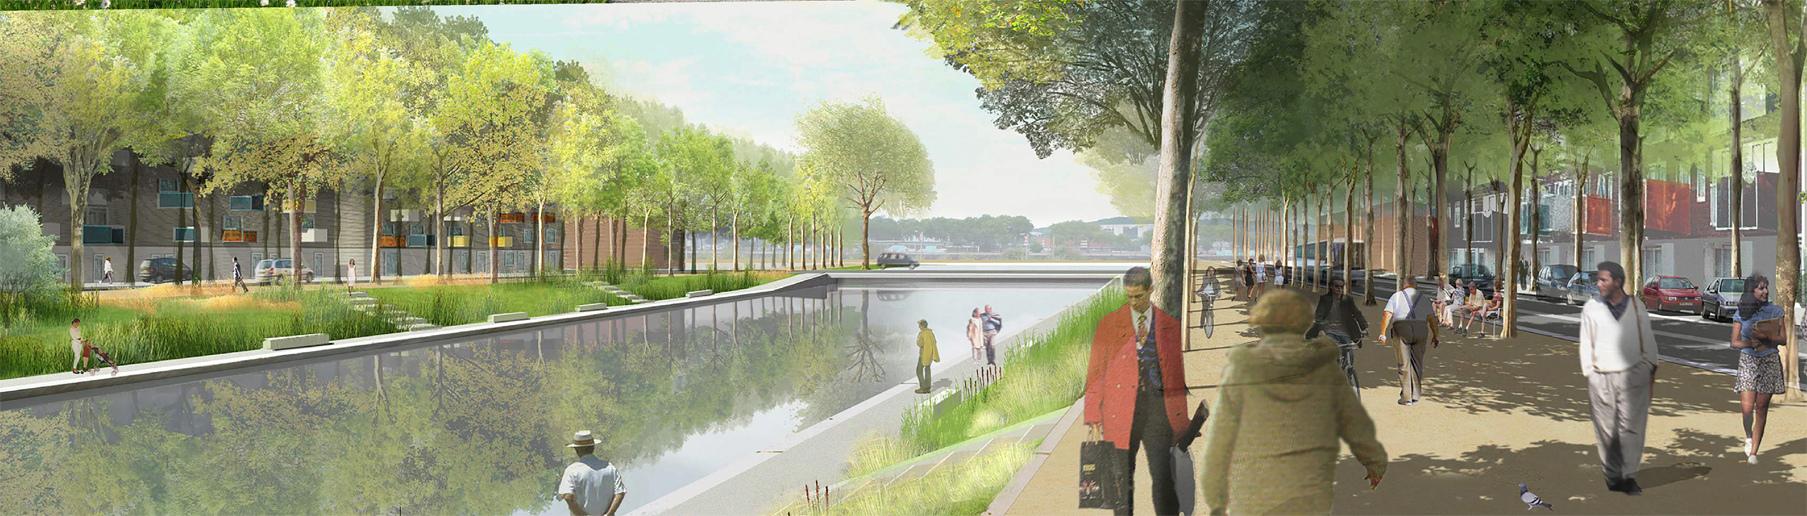 [Bientôt visible sur Google Earth] - Rouen - Ecoquartier Flaubert Canal10